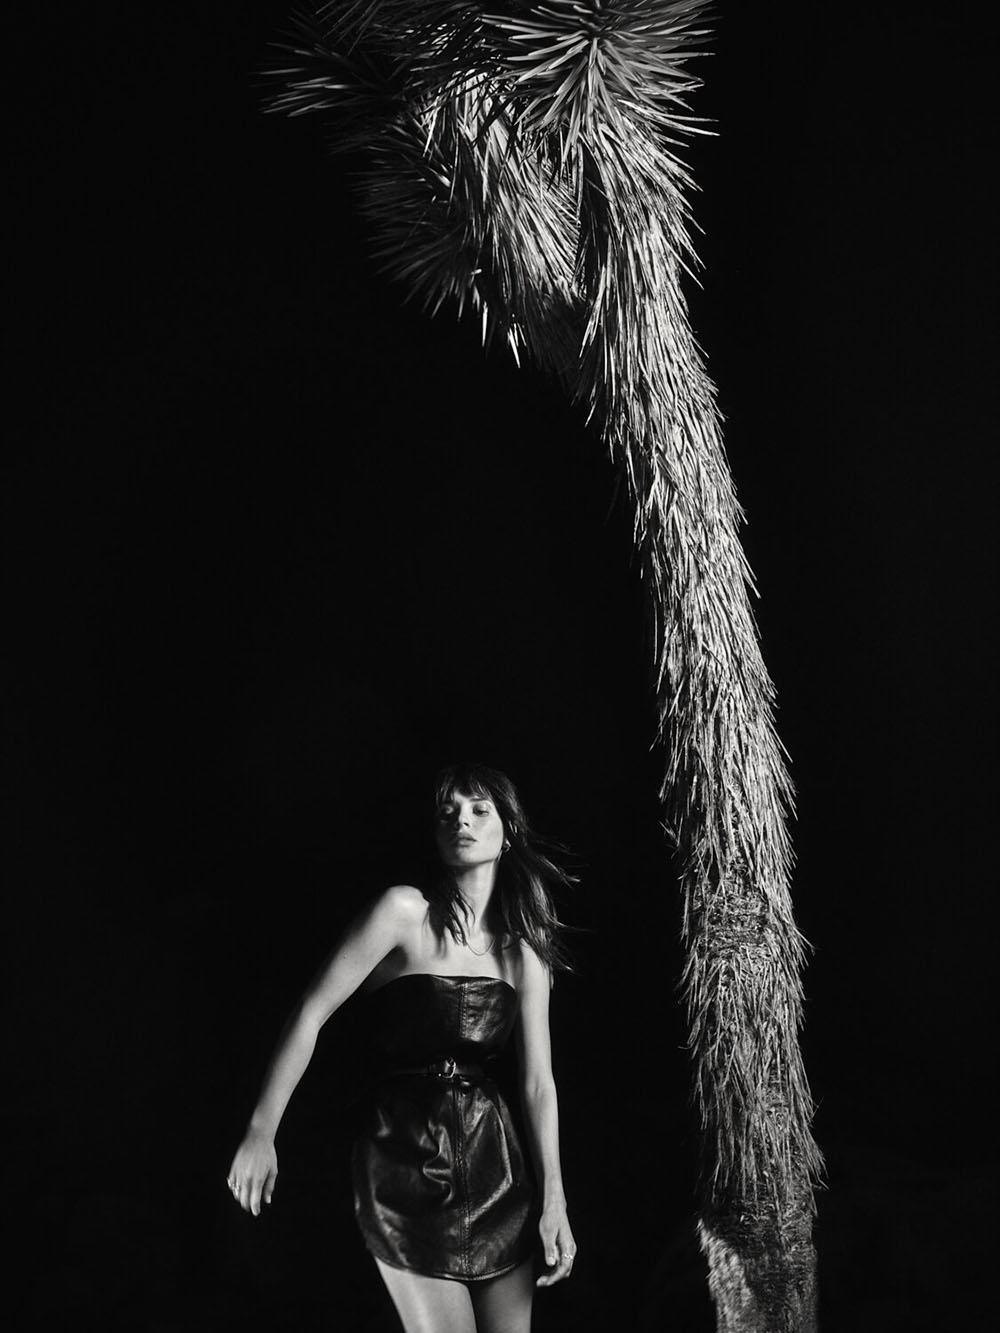 Adria Arjona covers Flaunt Magazine Issue 173 by Yulia Gorbachenko